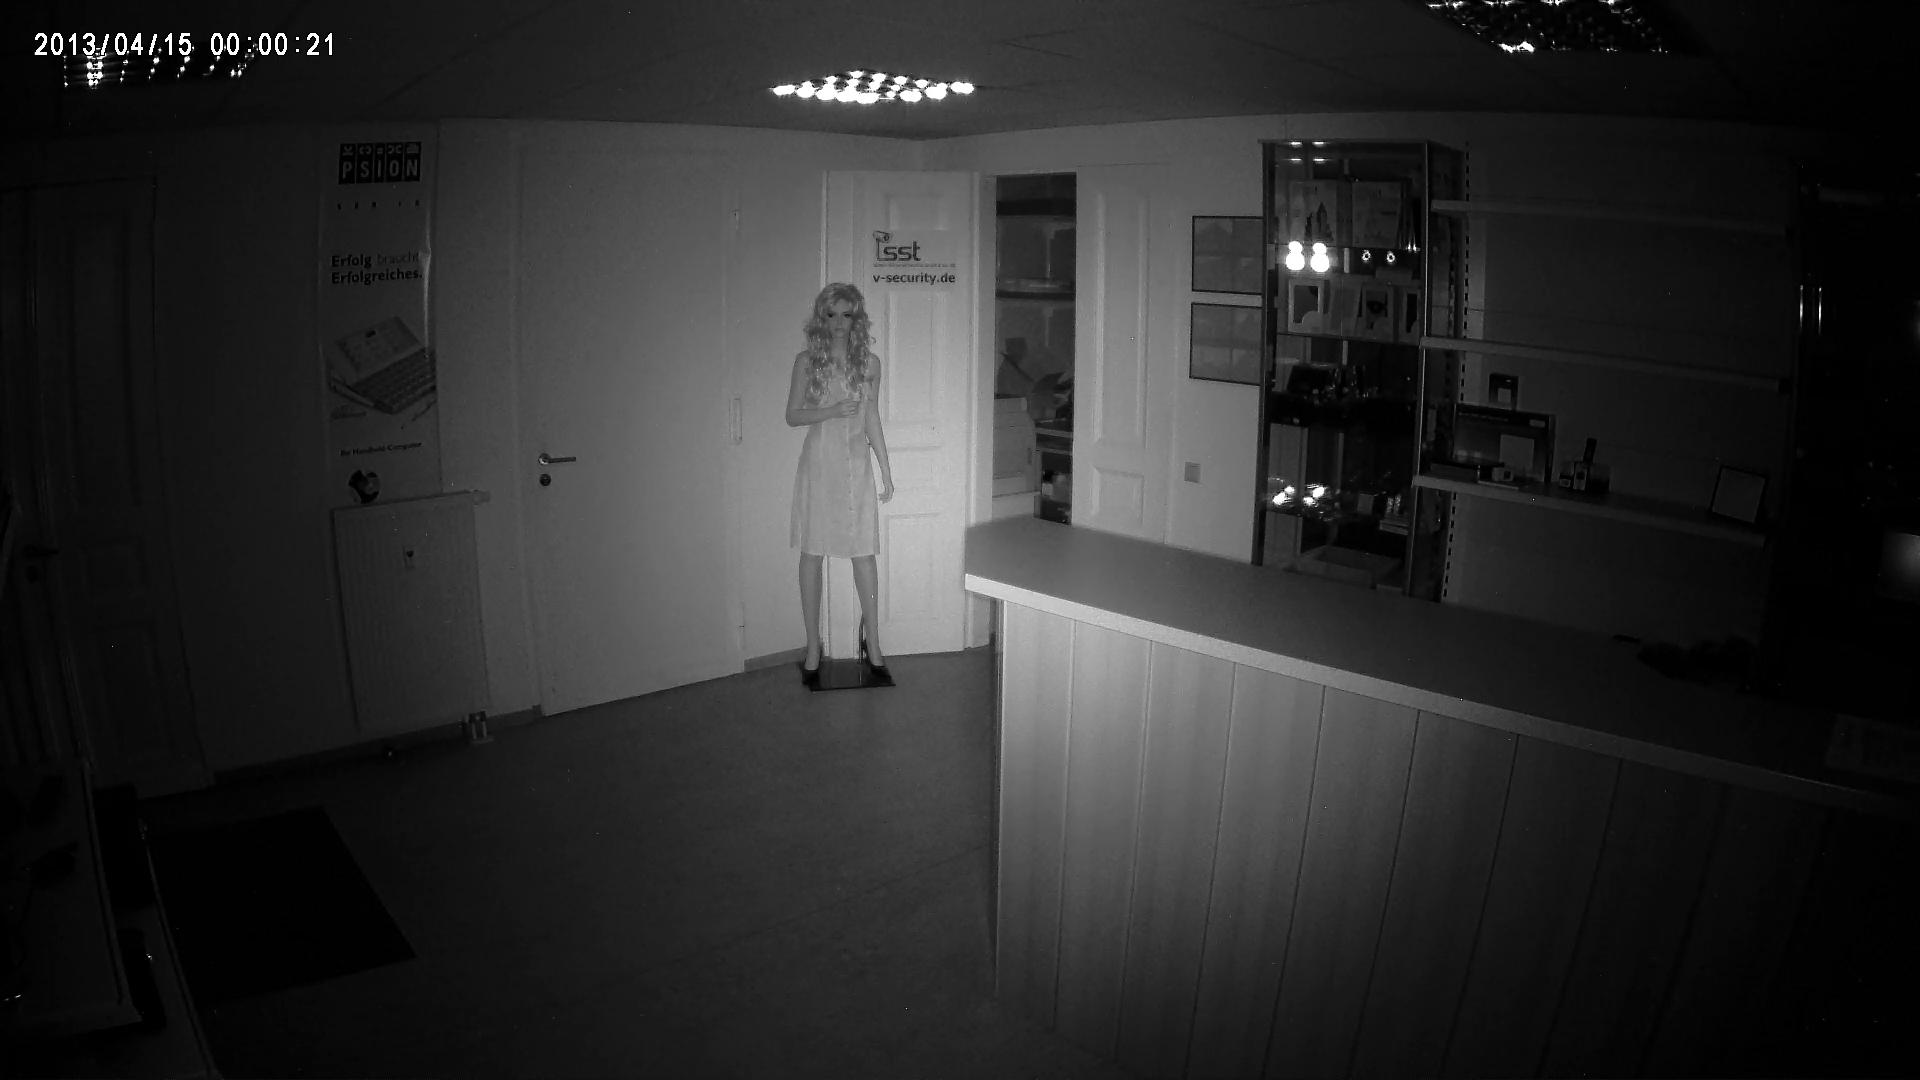 infrarot berwachungskamera tipps onlineshop f r hd. Black Bedroom Furniture Sets. Home Design Ideas